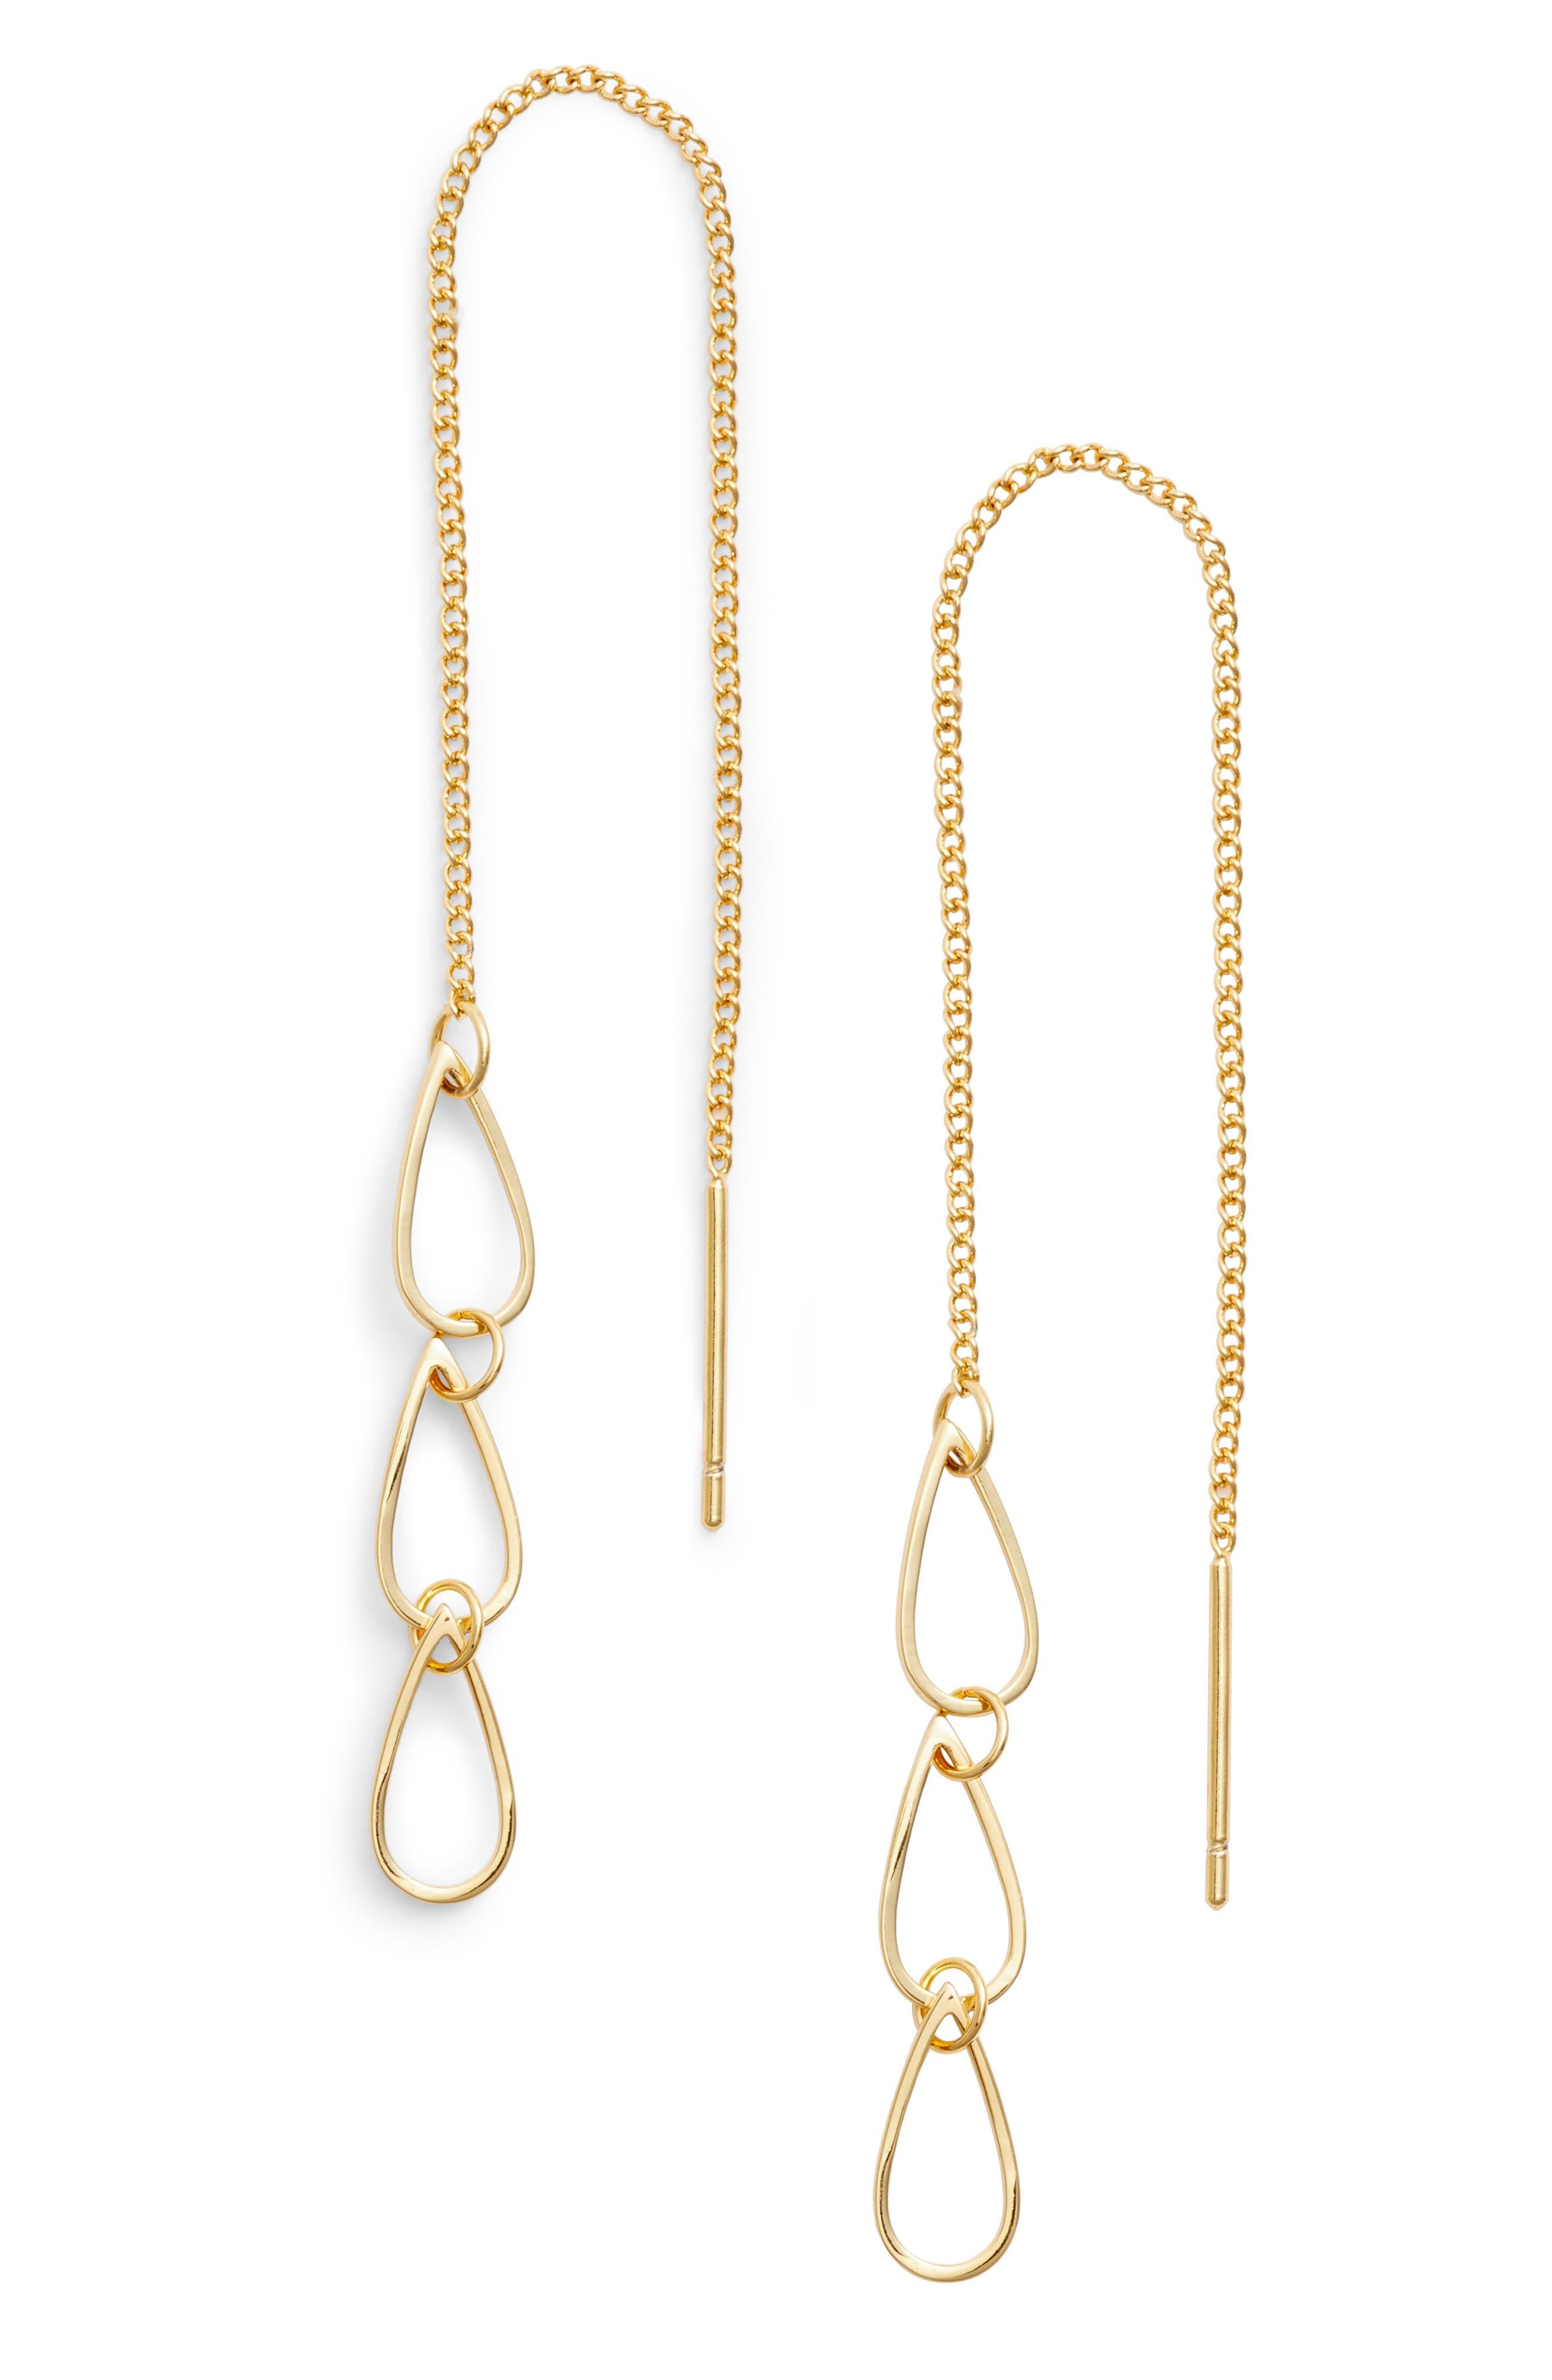 Leiko Threader Earrings,                         Main,                         color, 710